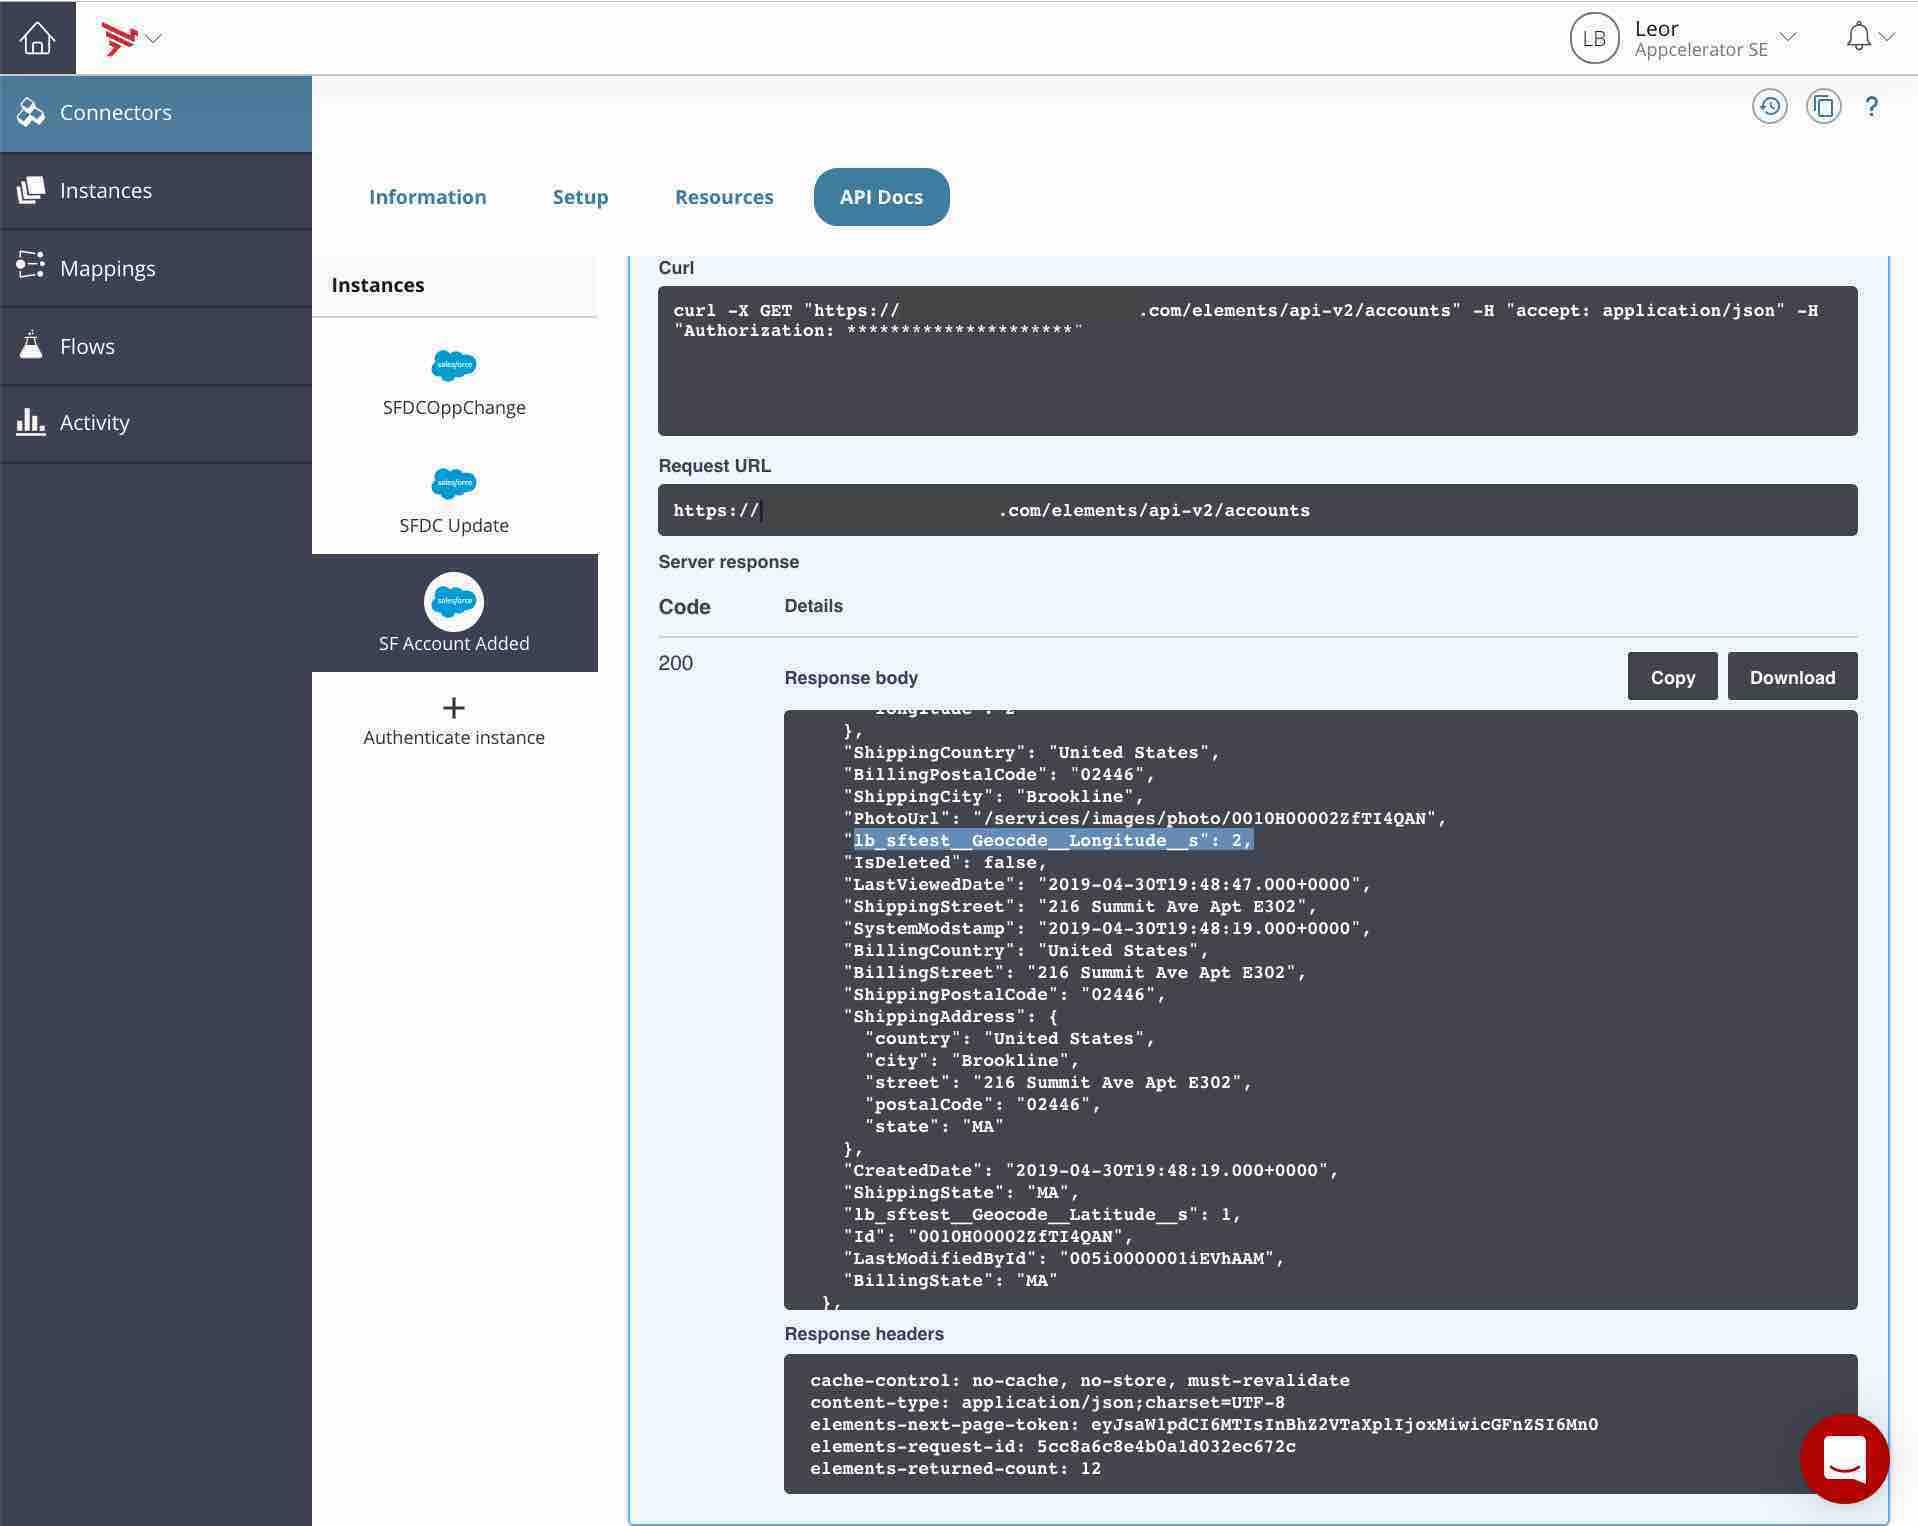 Geocode New Salesforce Accounts Using Axway's AMPLIFY Integration